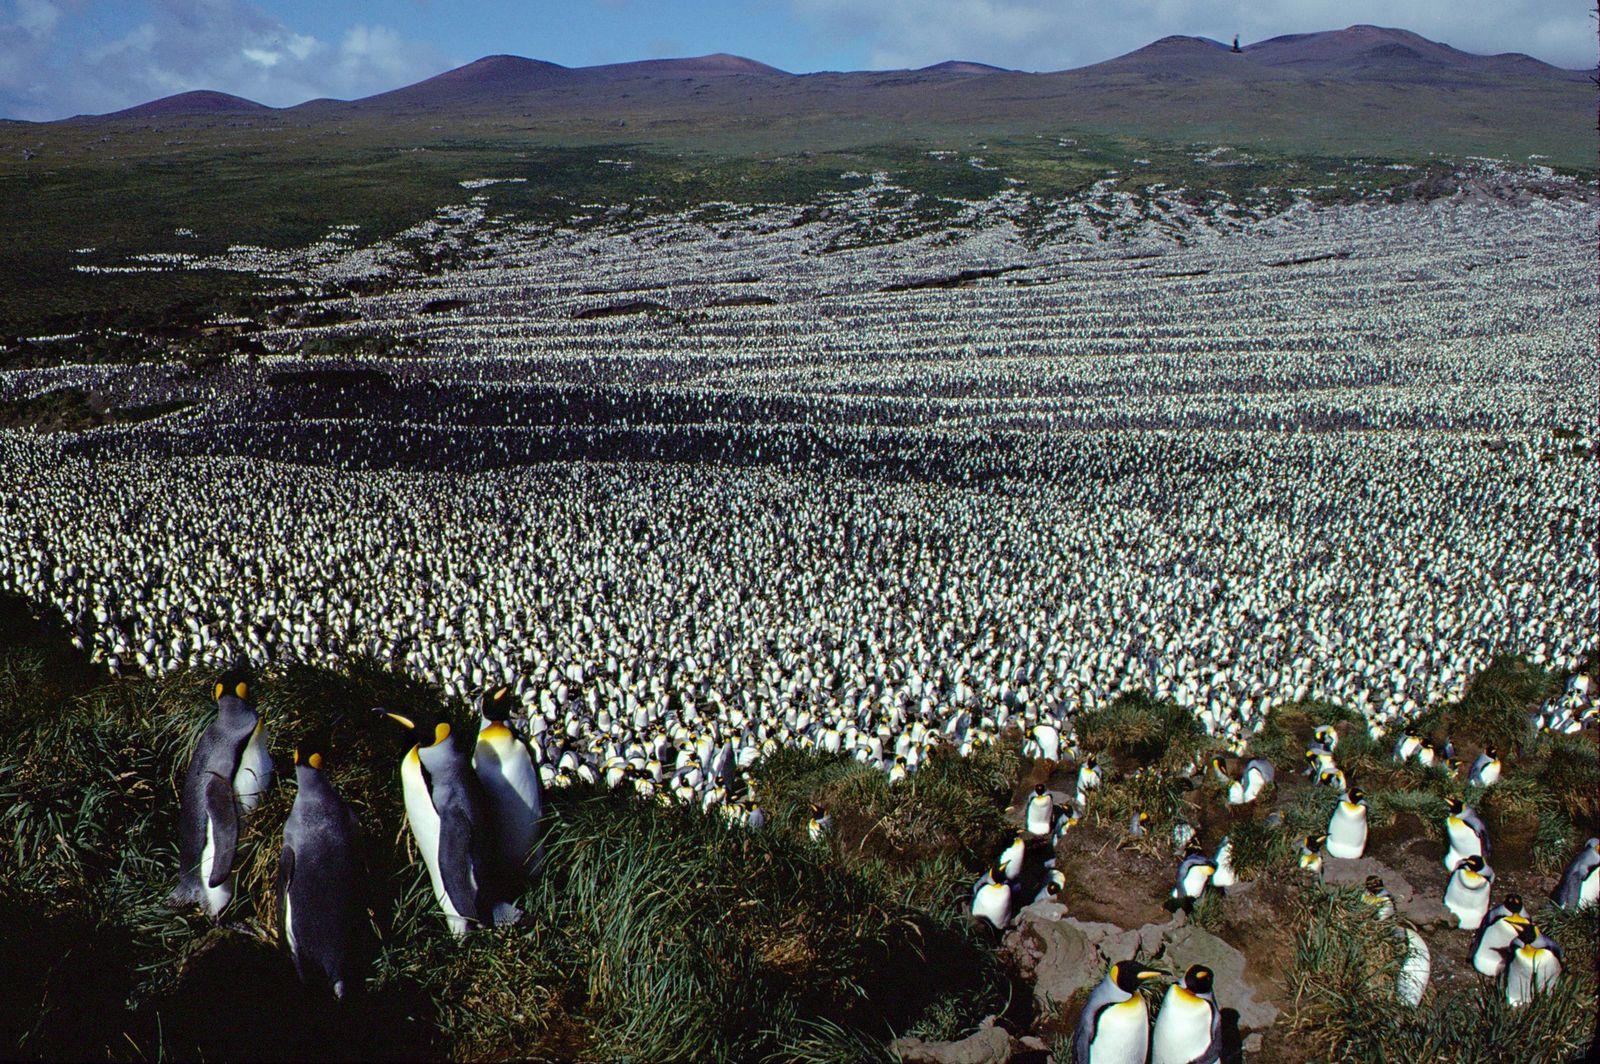 Pinguinkolonie auf Ile aux Cochons